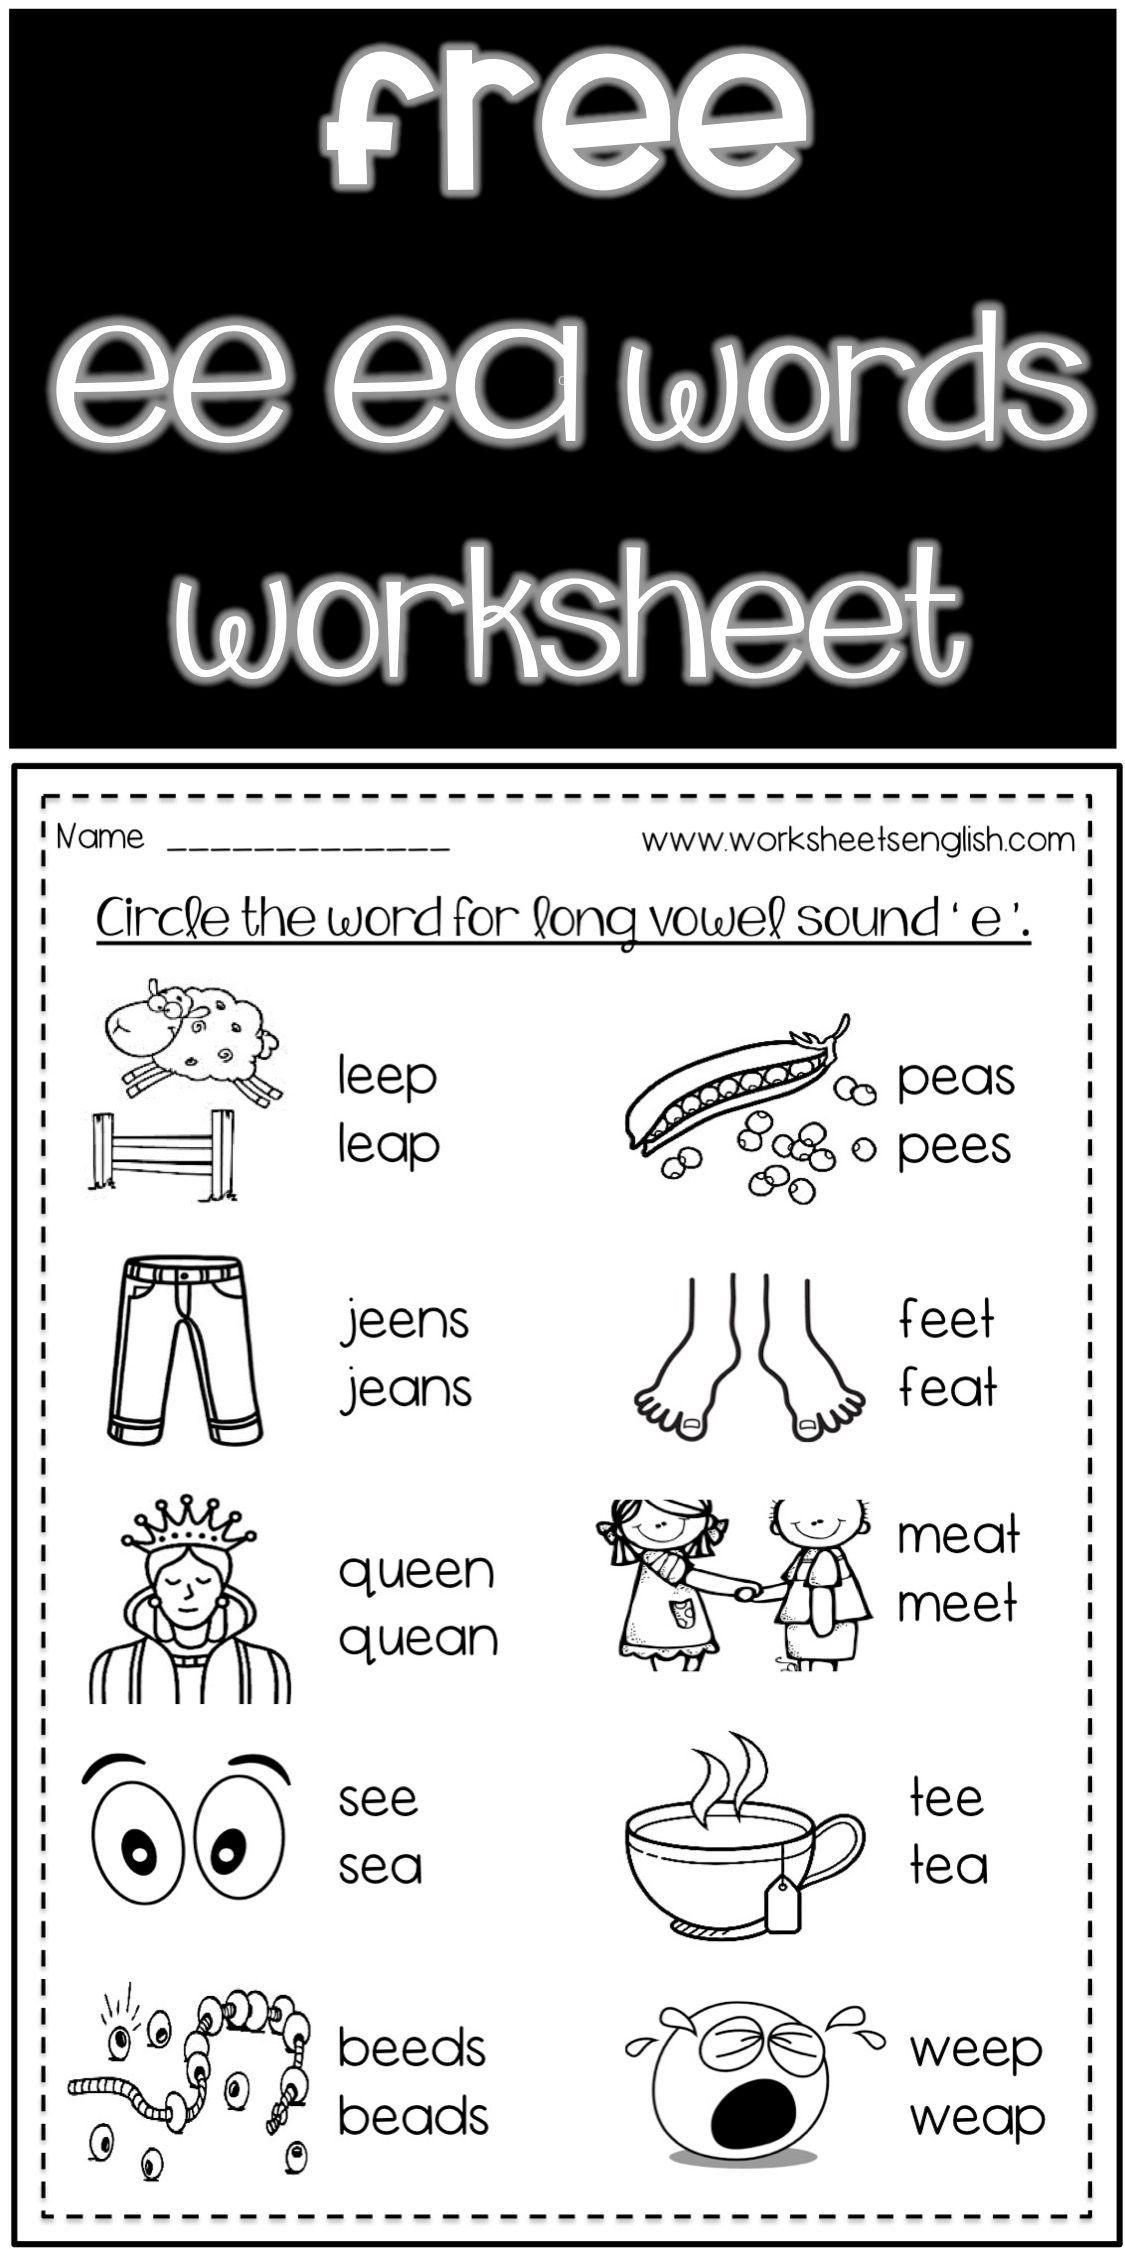 Long Vowel Words Spell Worksheets Free Www Worksheetsenglish Com Ea Words Long Vowel Words First Grade Phonics [ 2249 x 1125 Pixel ]